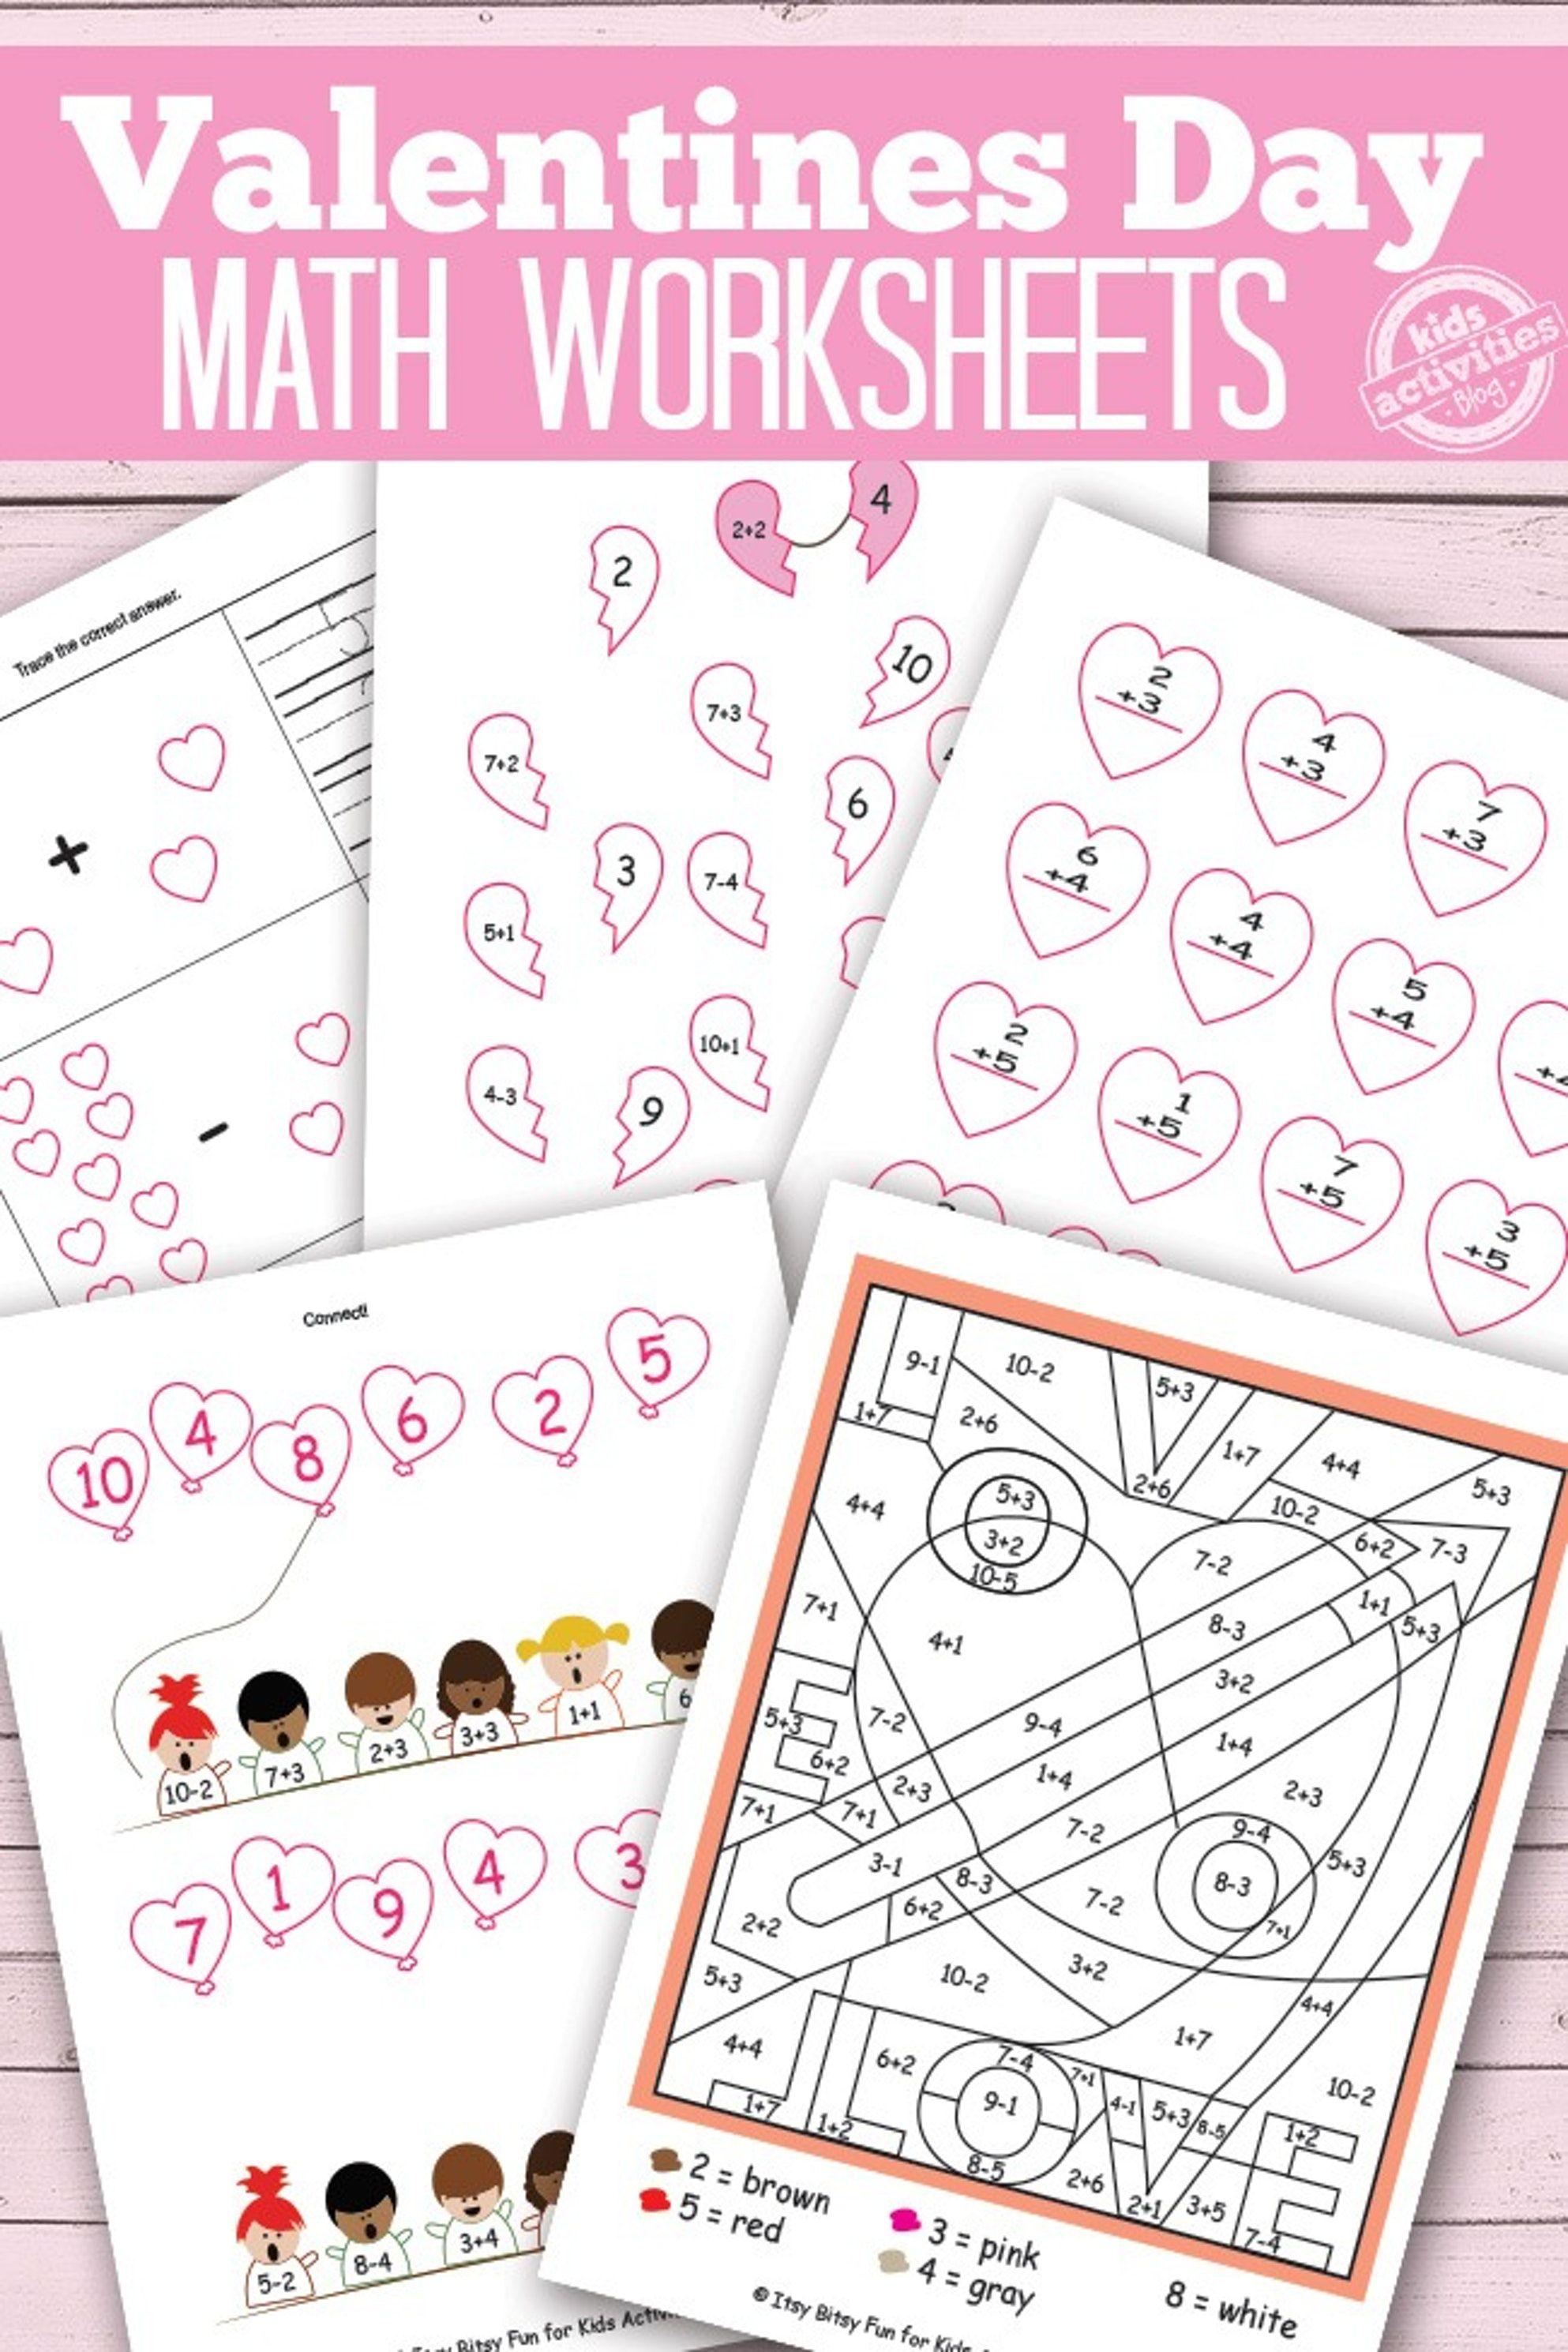 Valentines Day Math Worksheets Free Kids Printables